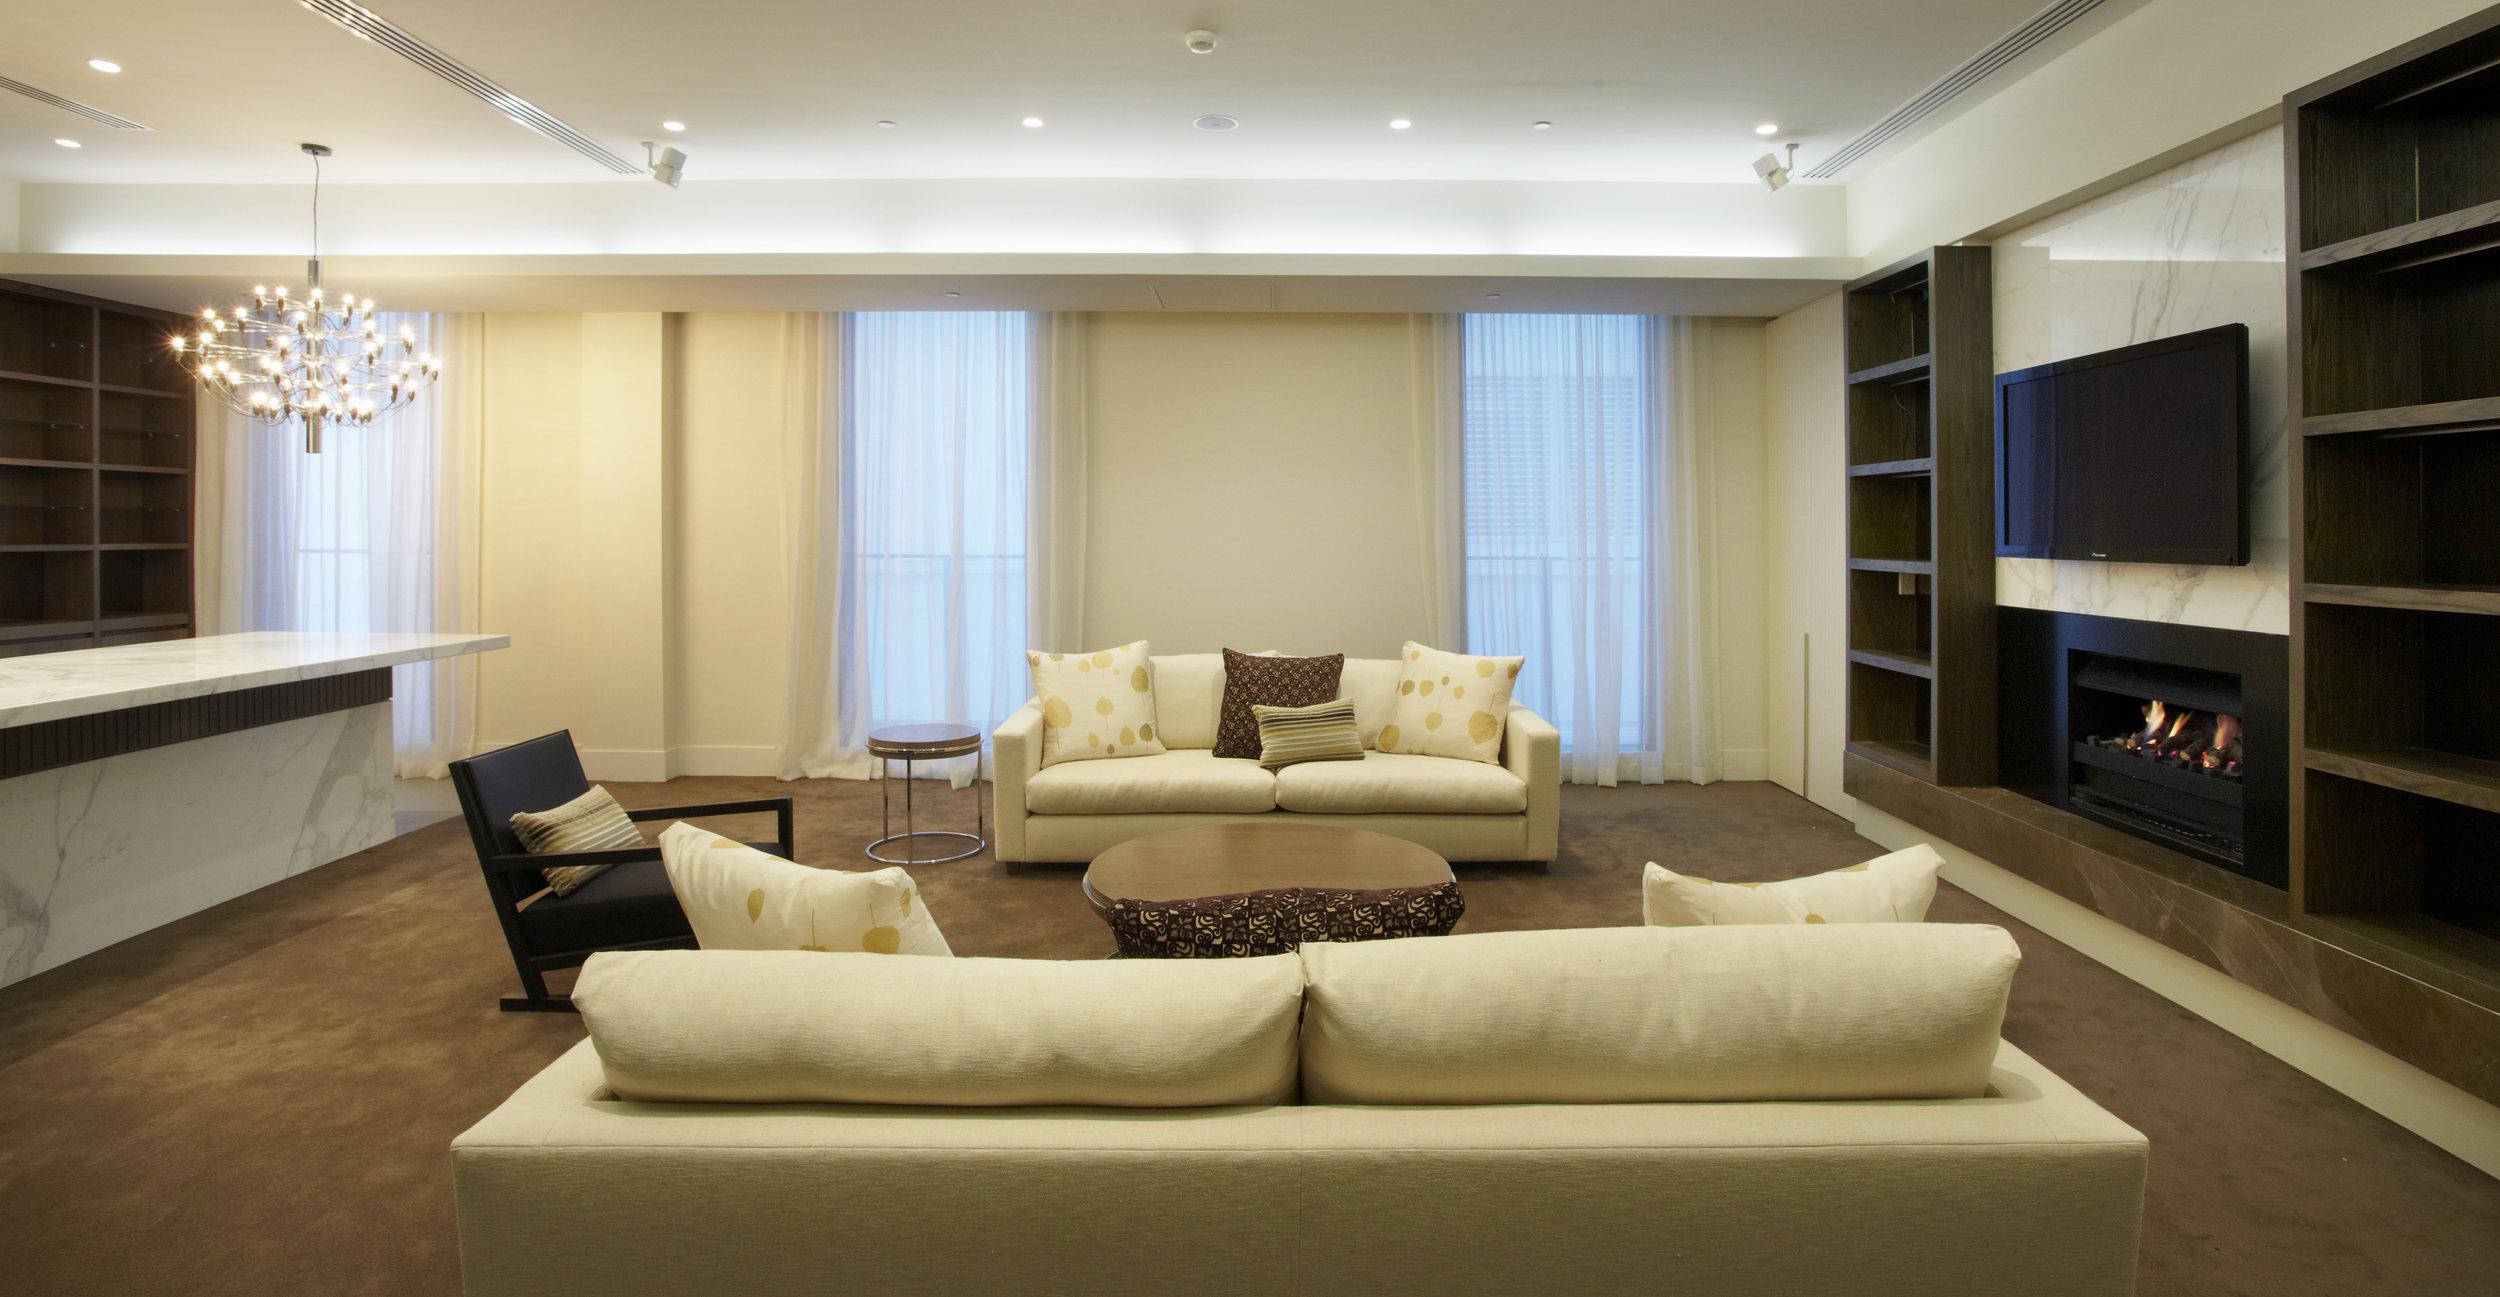 150 ClarendonSt_L1 Lounge.jpg